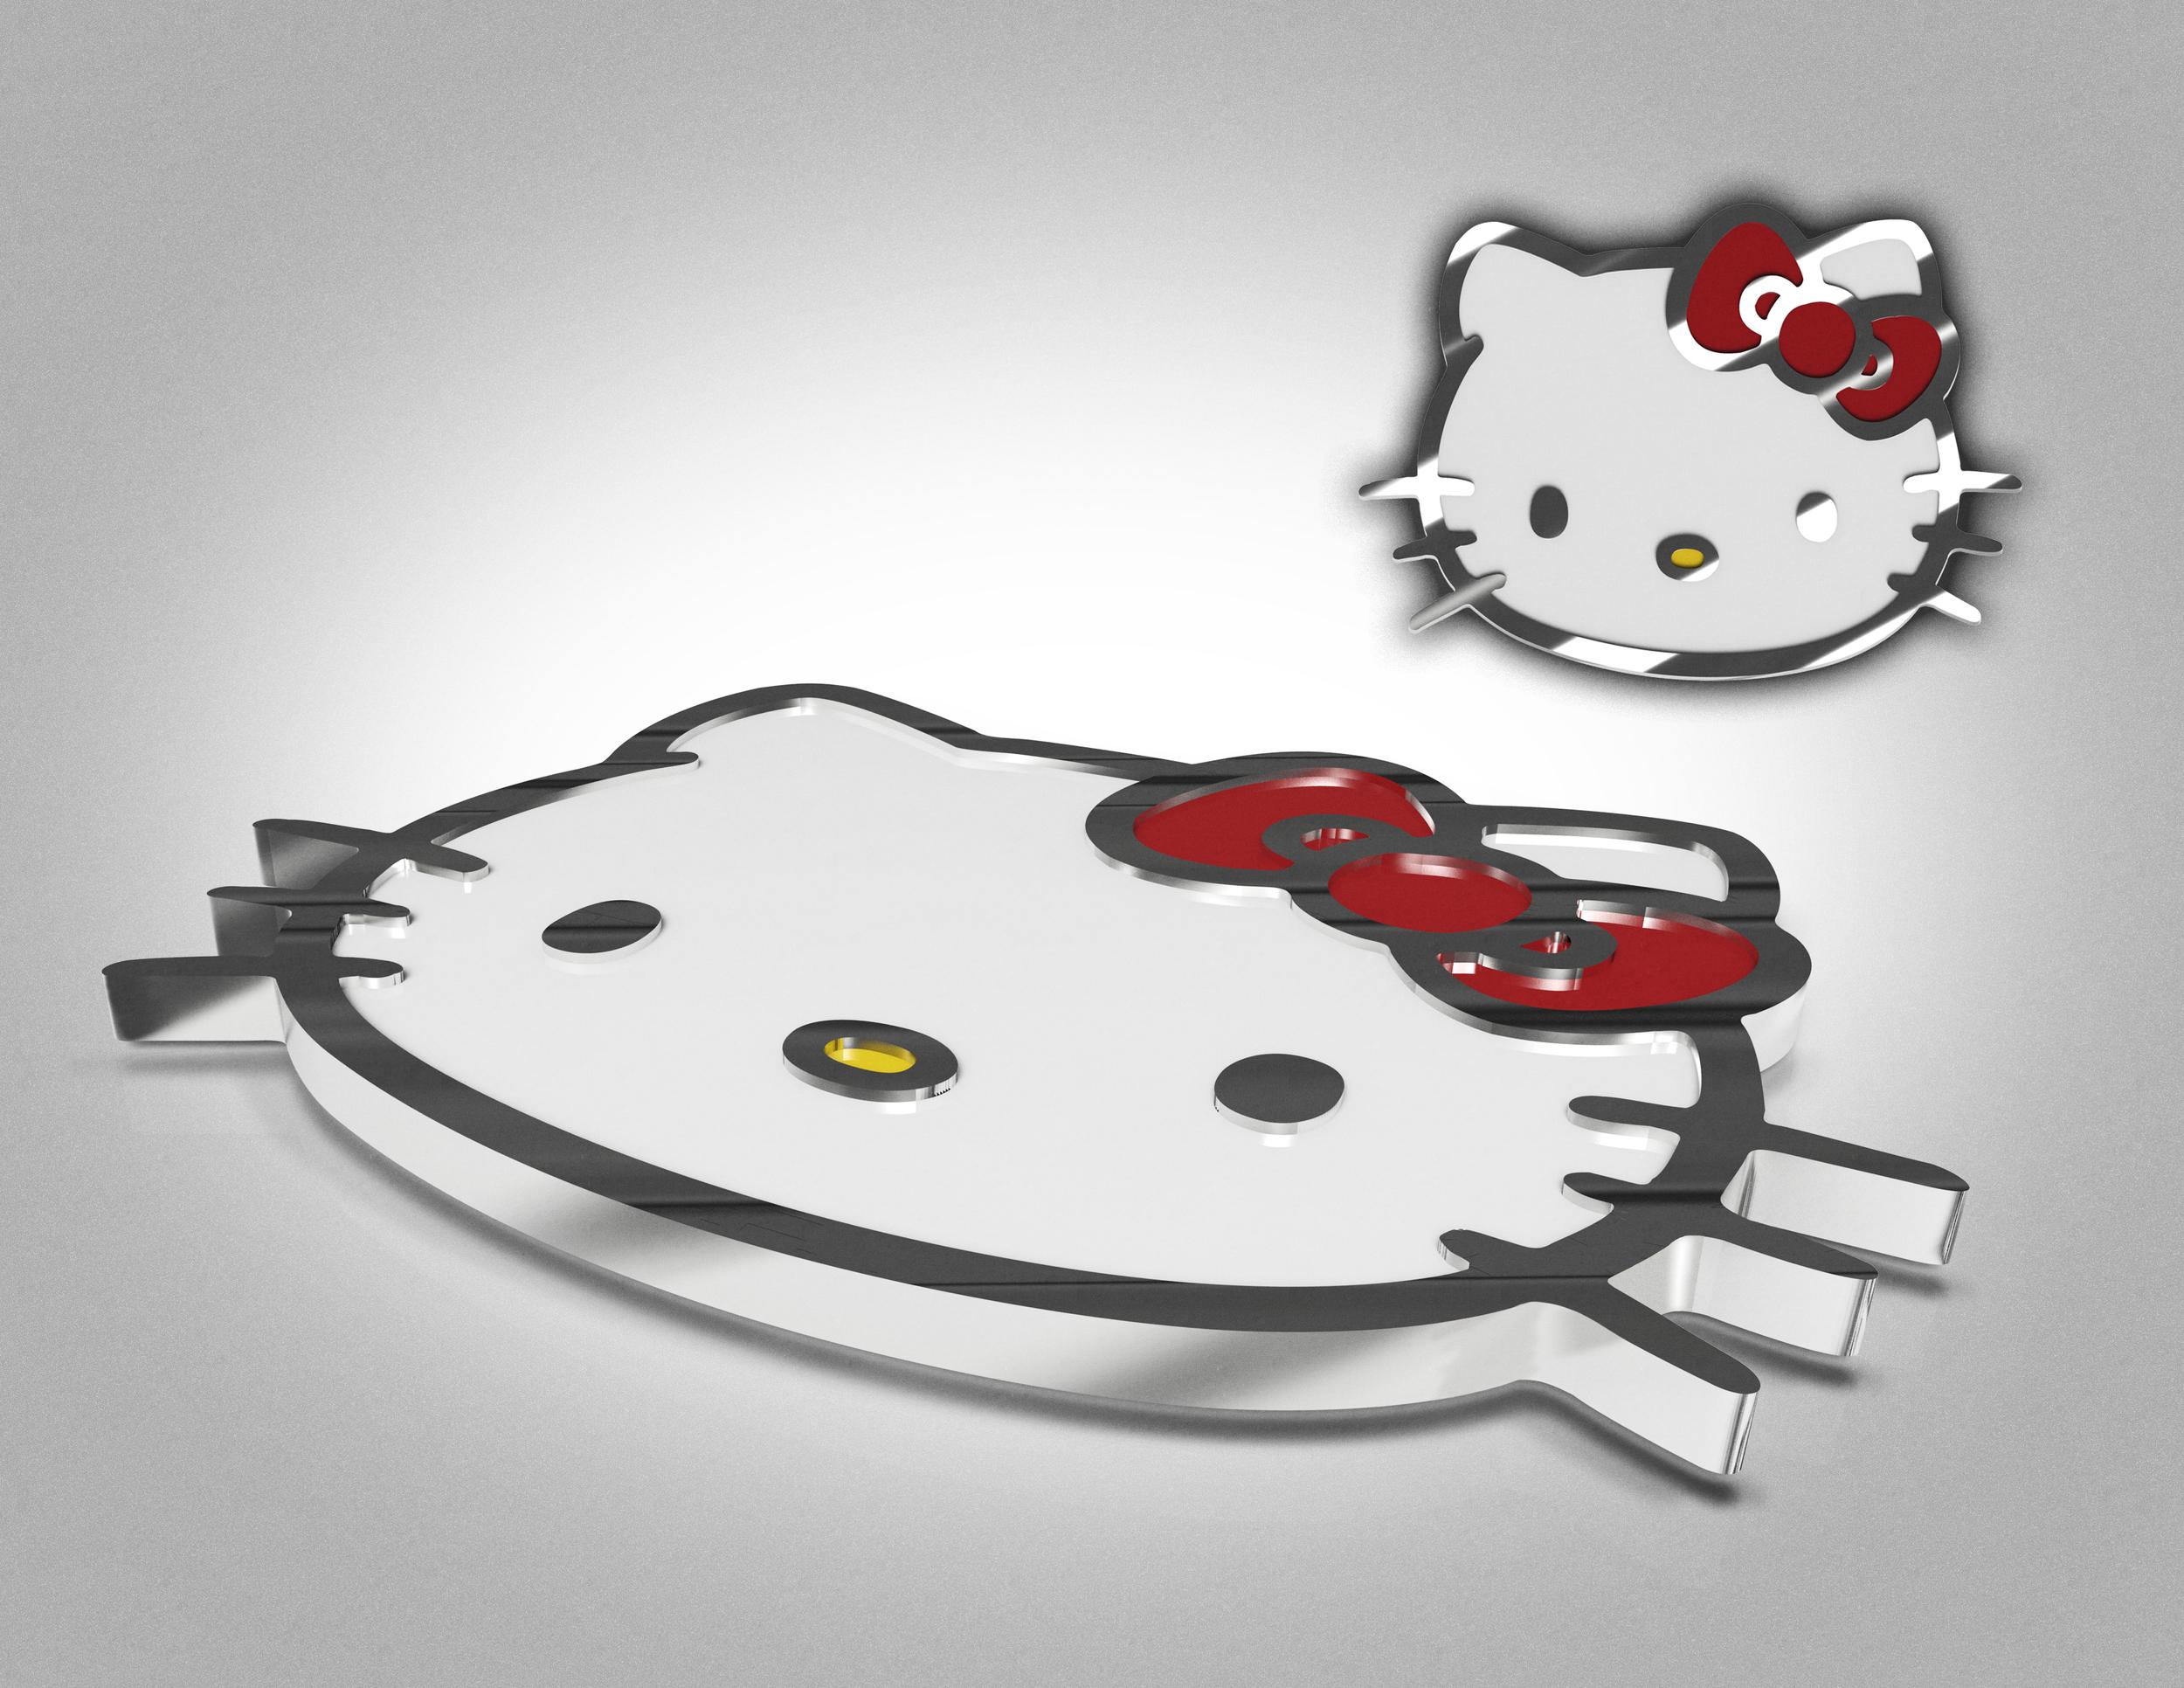 Static Renderings of Hello Kitty Brand Badge